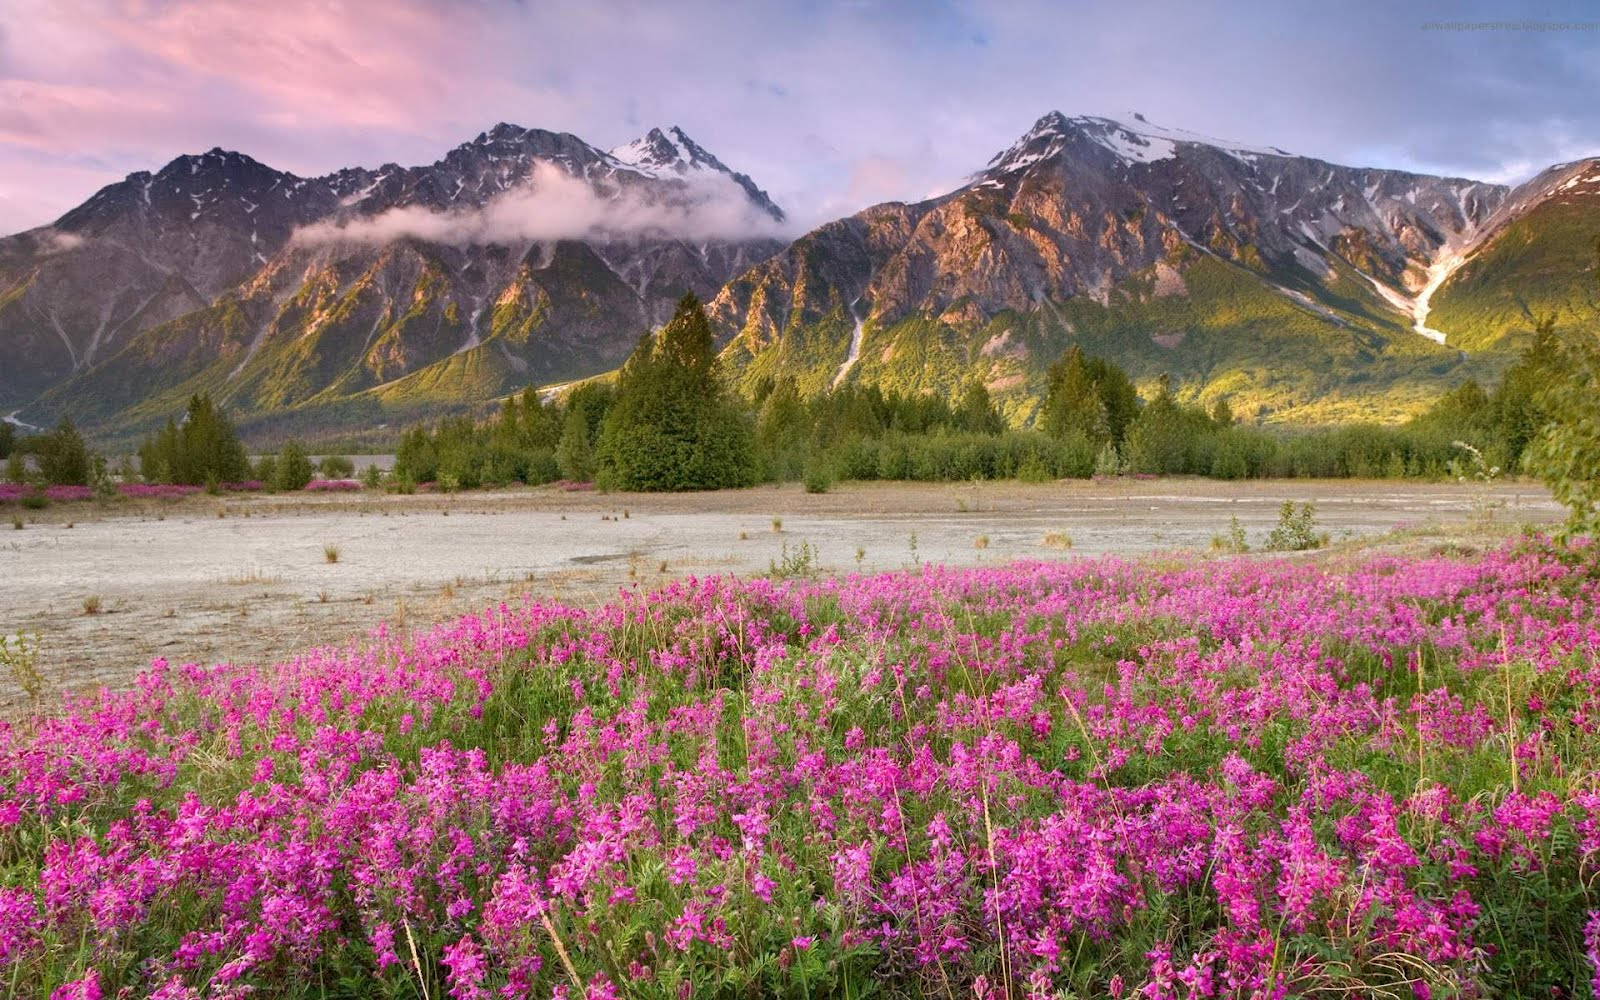 http://4.bp.blogspot.com/-HnZahD57X7E/TzfFecv9I5I/AAAAAAAAALA/Fsjz-3cyhnM/s1600/40-Beautiful-Canada-Landscapes-HD-Wallpapers-1.jpg